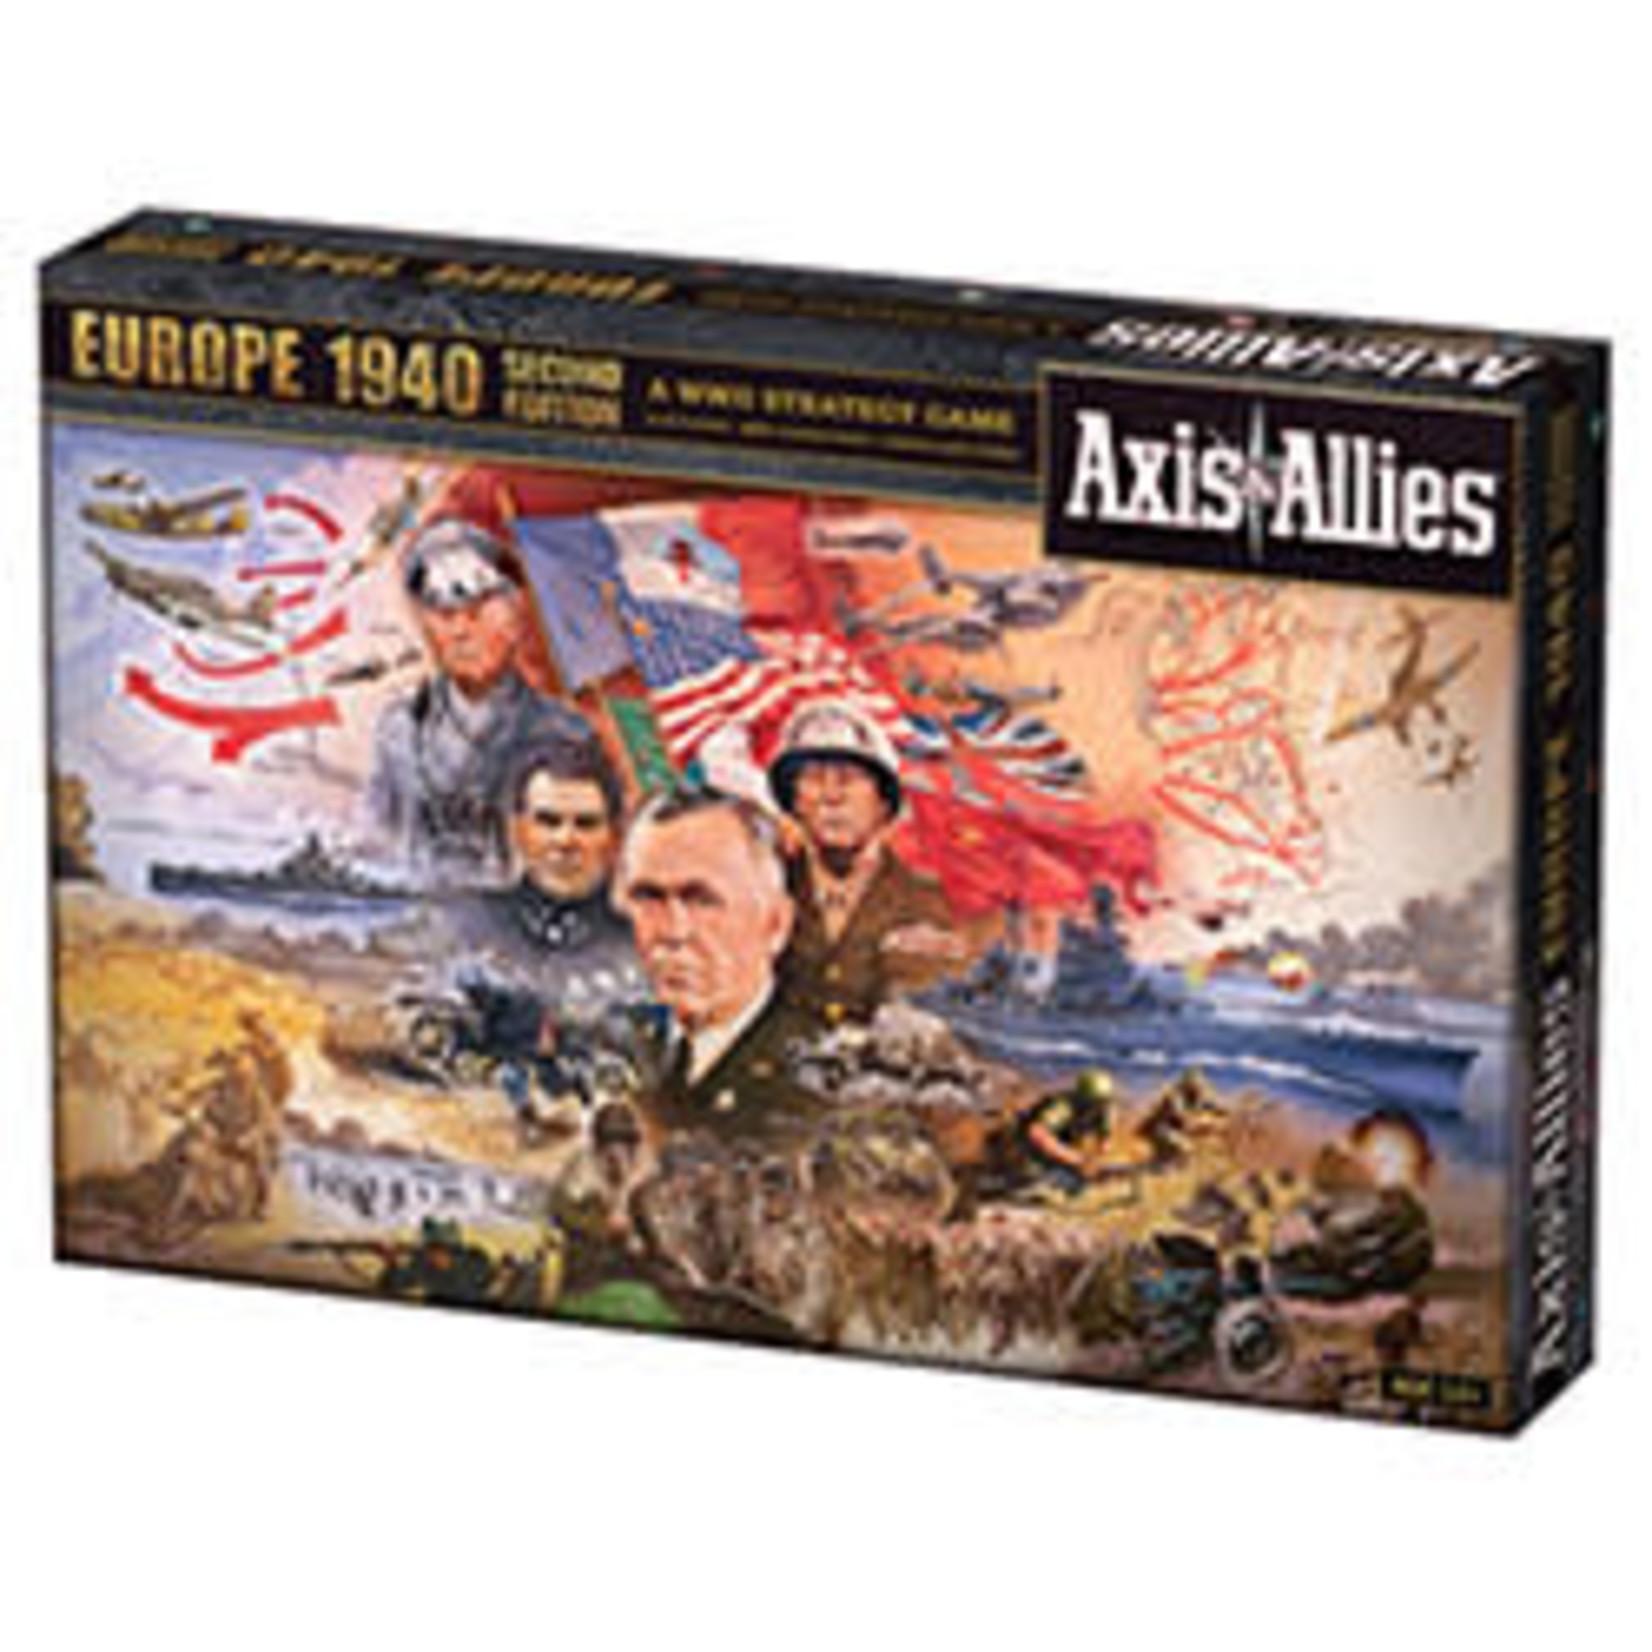 WOTC AH Axis & Allies: 1940 Europe 2nd Edition